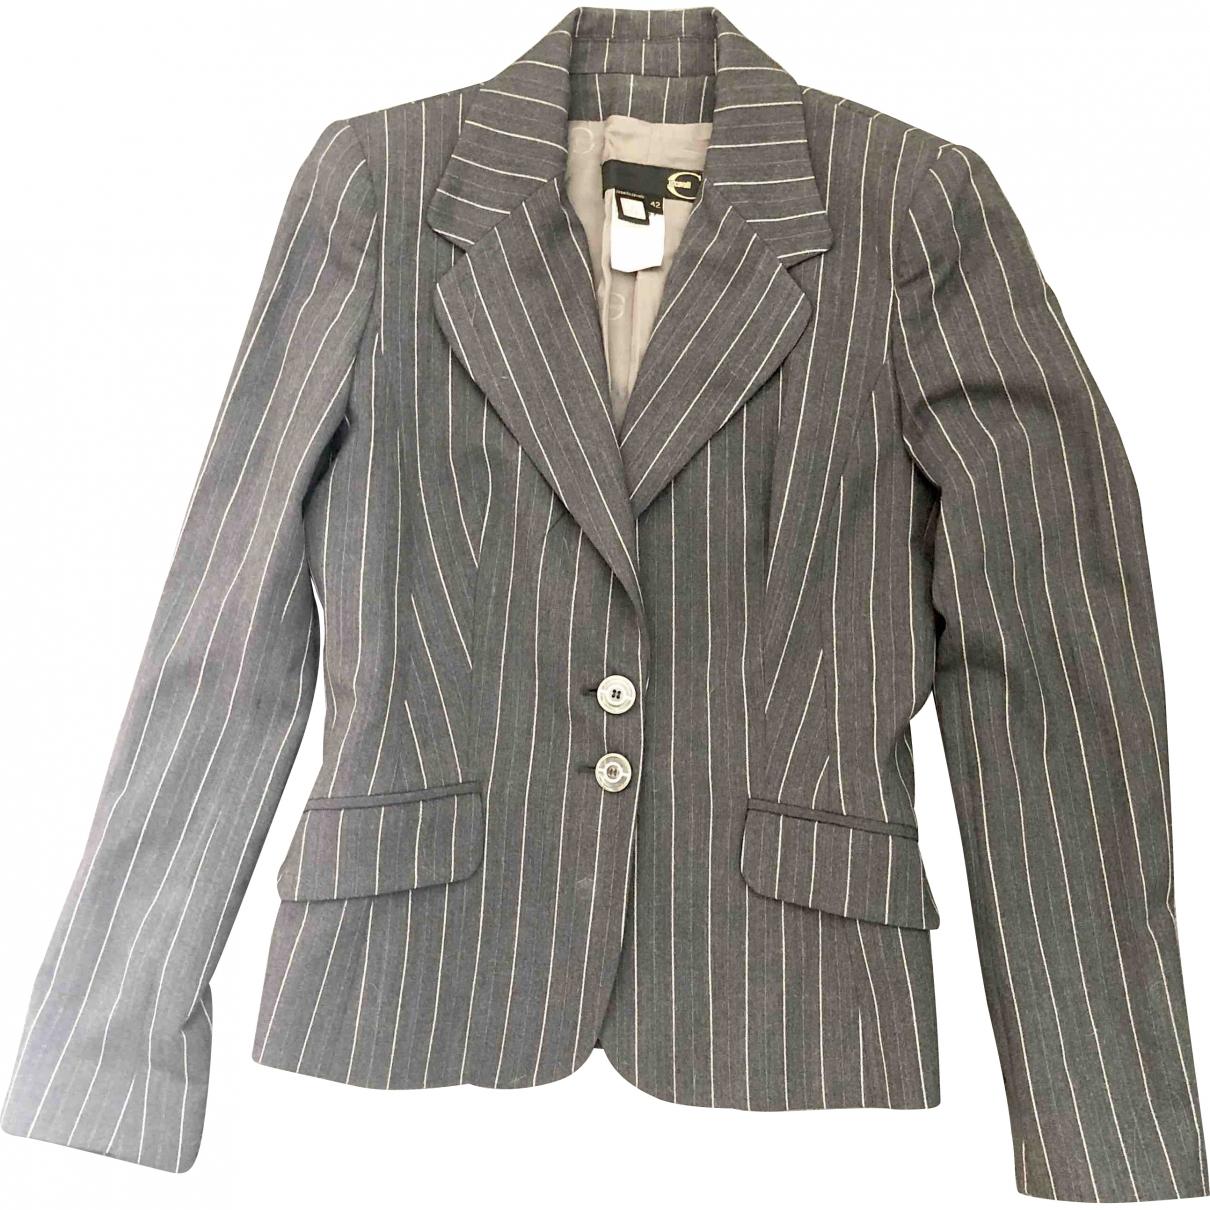 Just Cavalli \N Grey Wool jacket for Women 38 FR